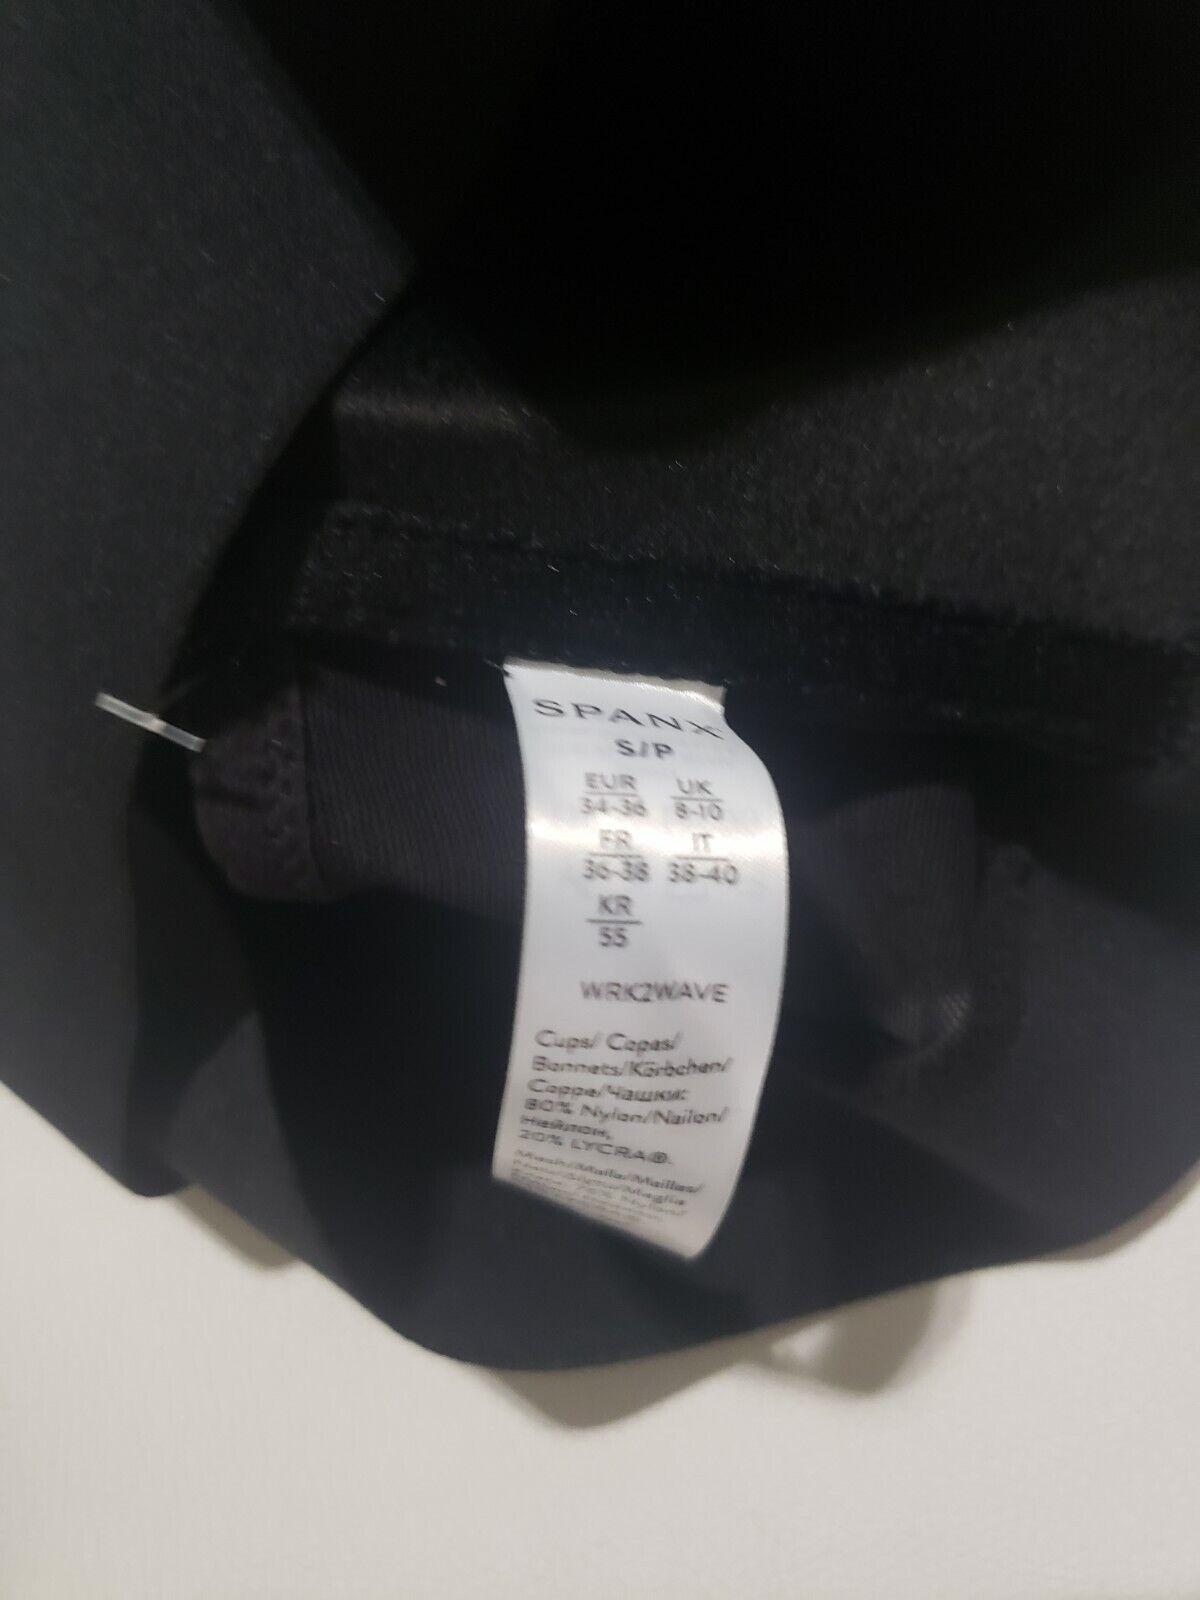 Spanx Mesh Panel Medium Impact Sports Bra - Black - S -new with tag price